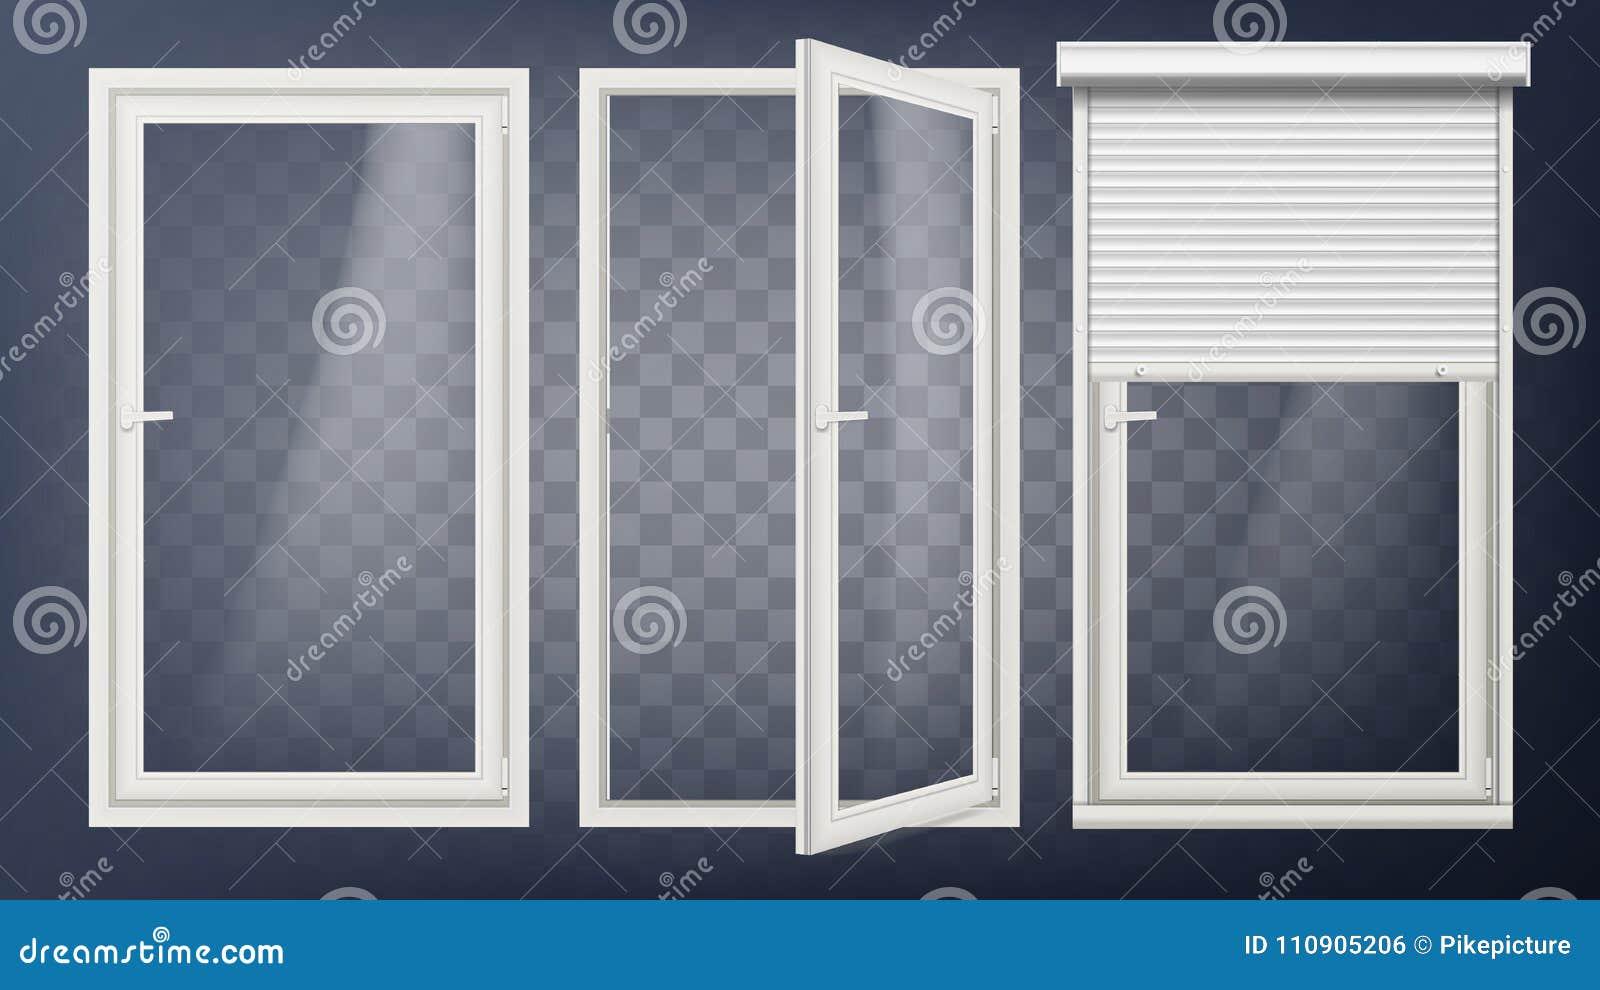 Plastic Door Vector Pvc Plastic Profile White Empty Roller Shutter